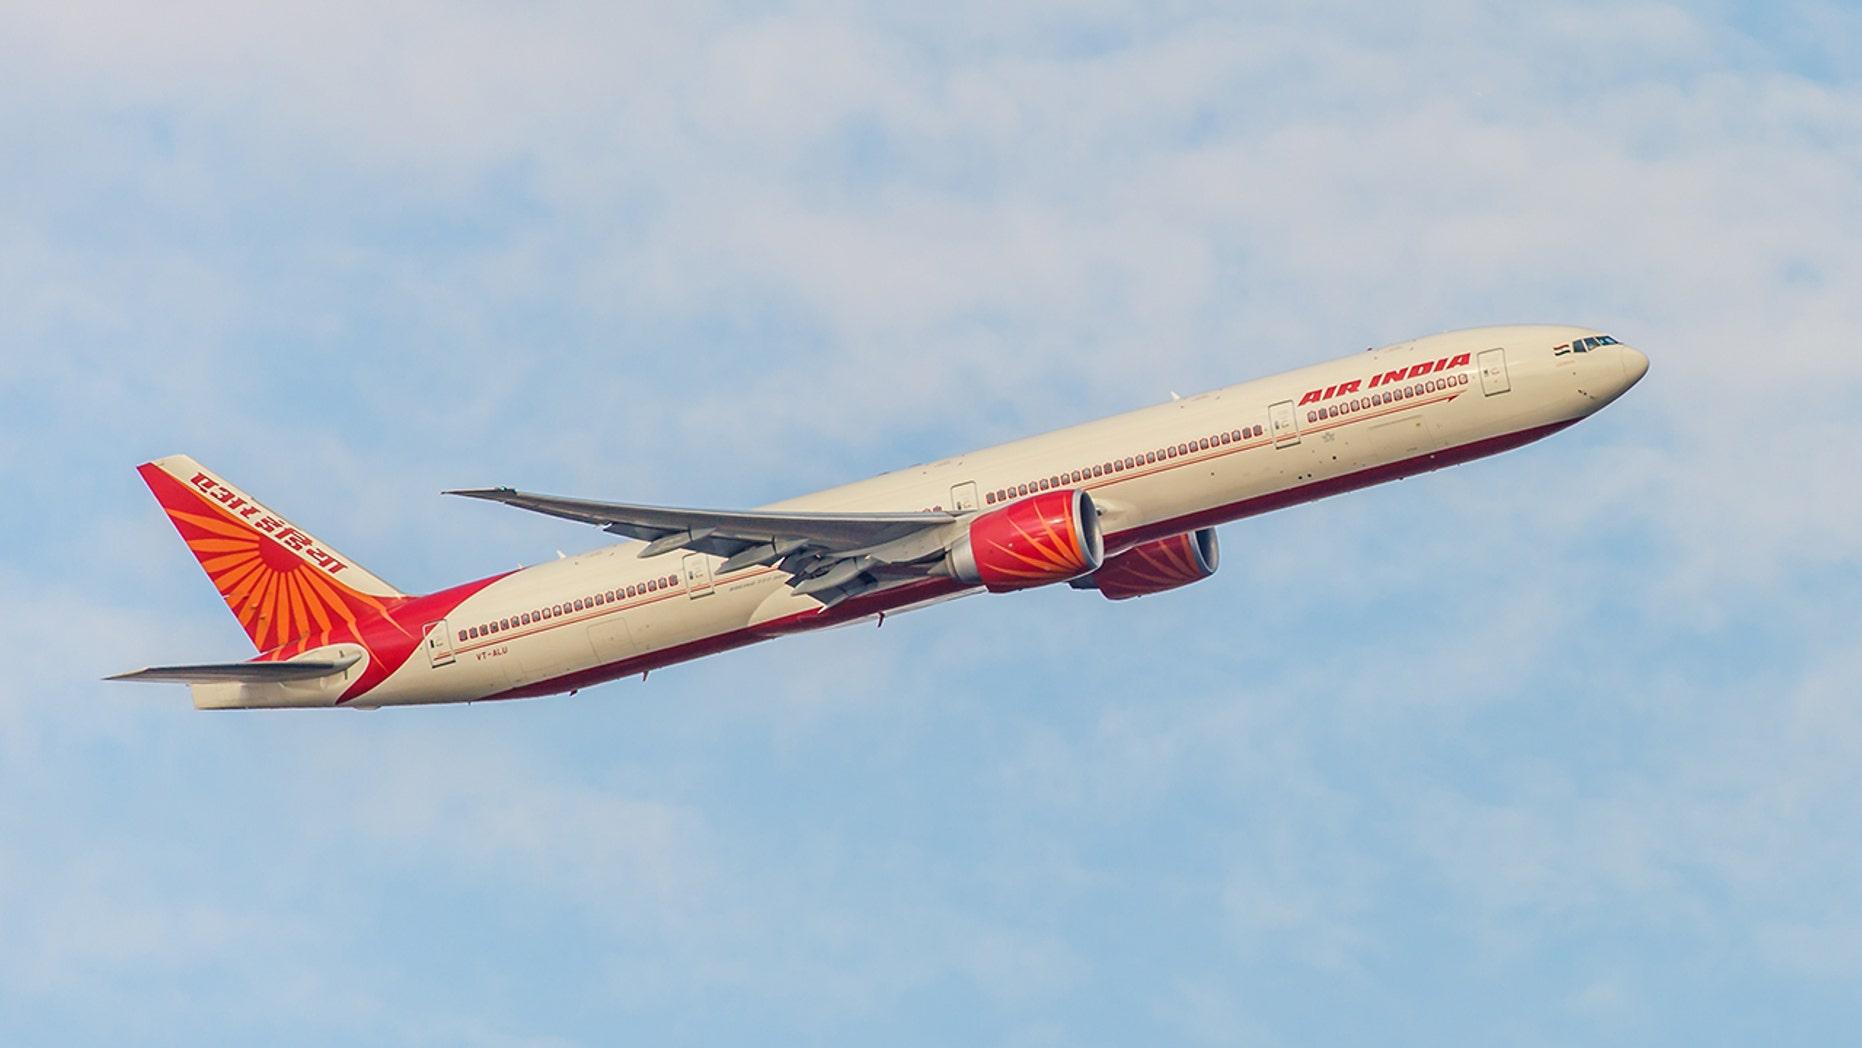 An Air India jet is seen in flight, Nov. 2, 2013.